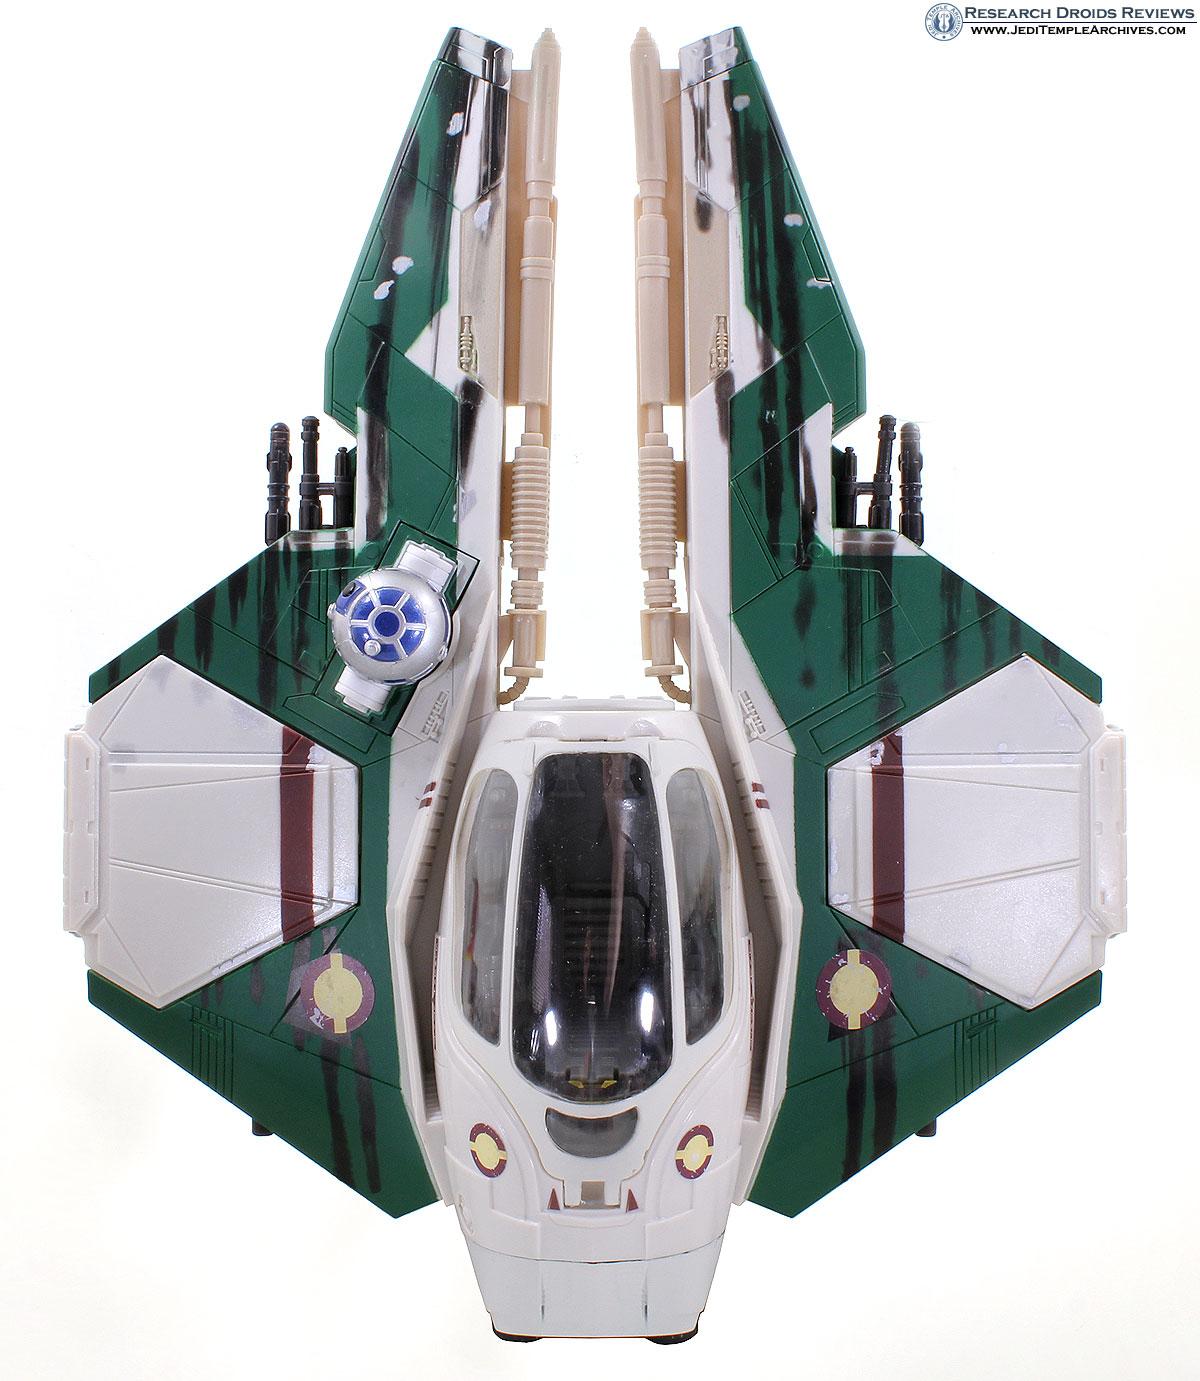 Anakin's Jedi Starfighter with Anakin (Mustafar) -